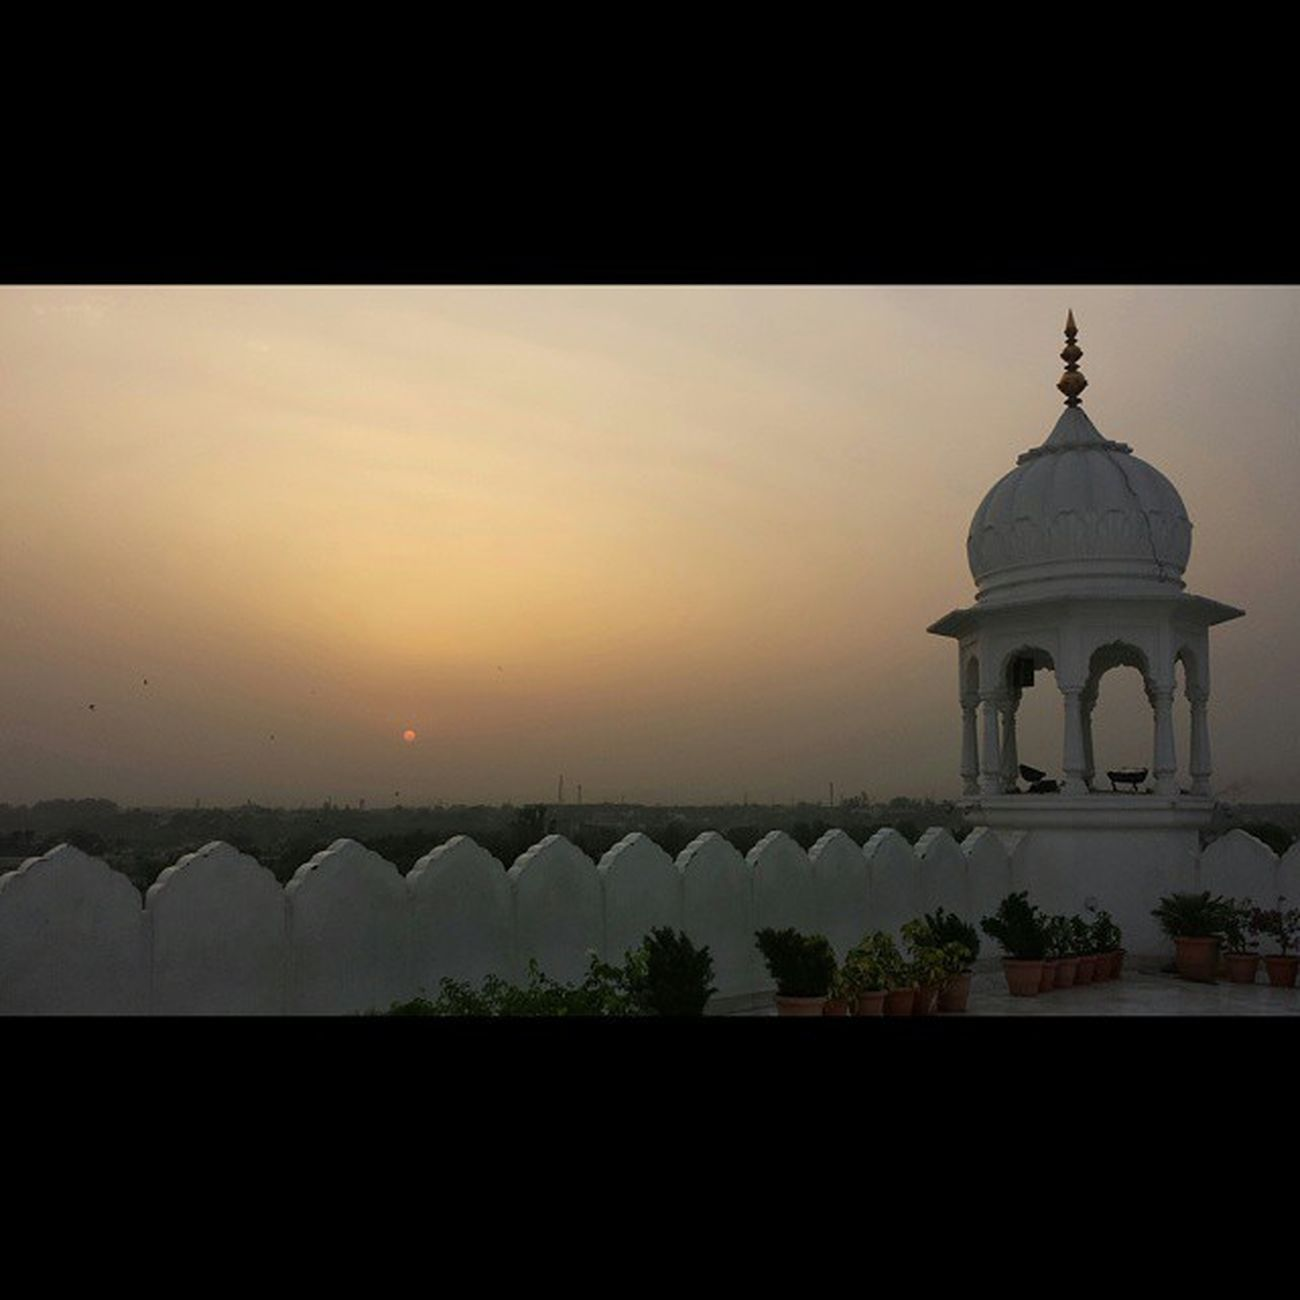 Sunset in ANANDPURSAHIB Gurdwara AnandGharh Punjab India setlife doclife Sikh sikhlife